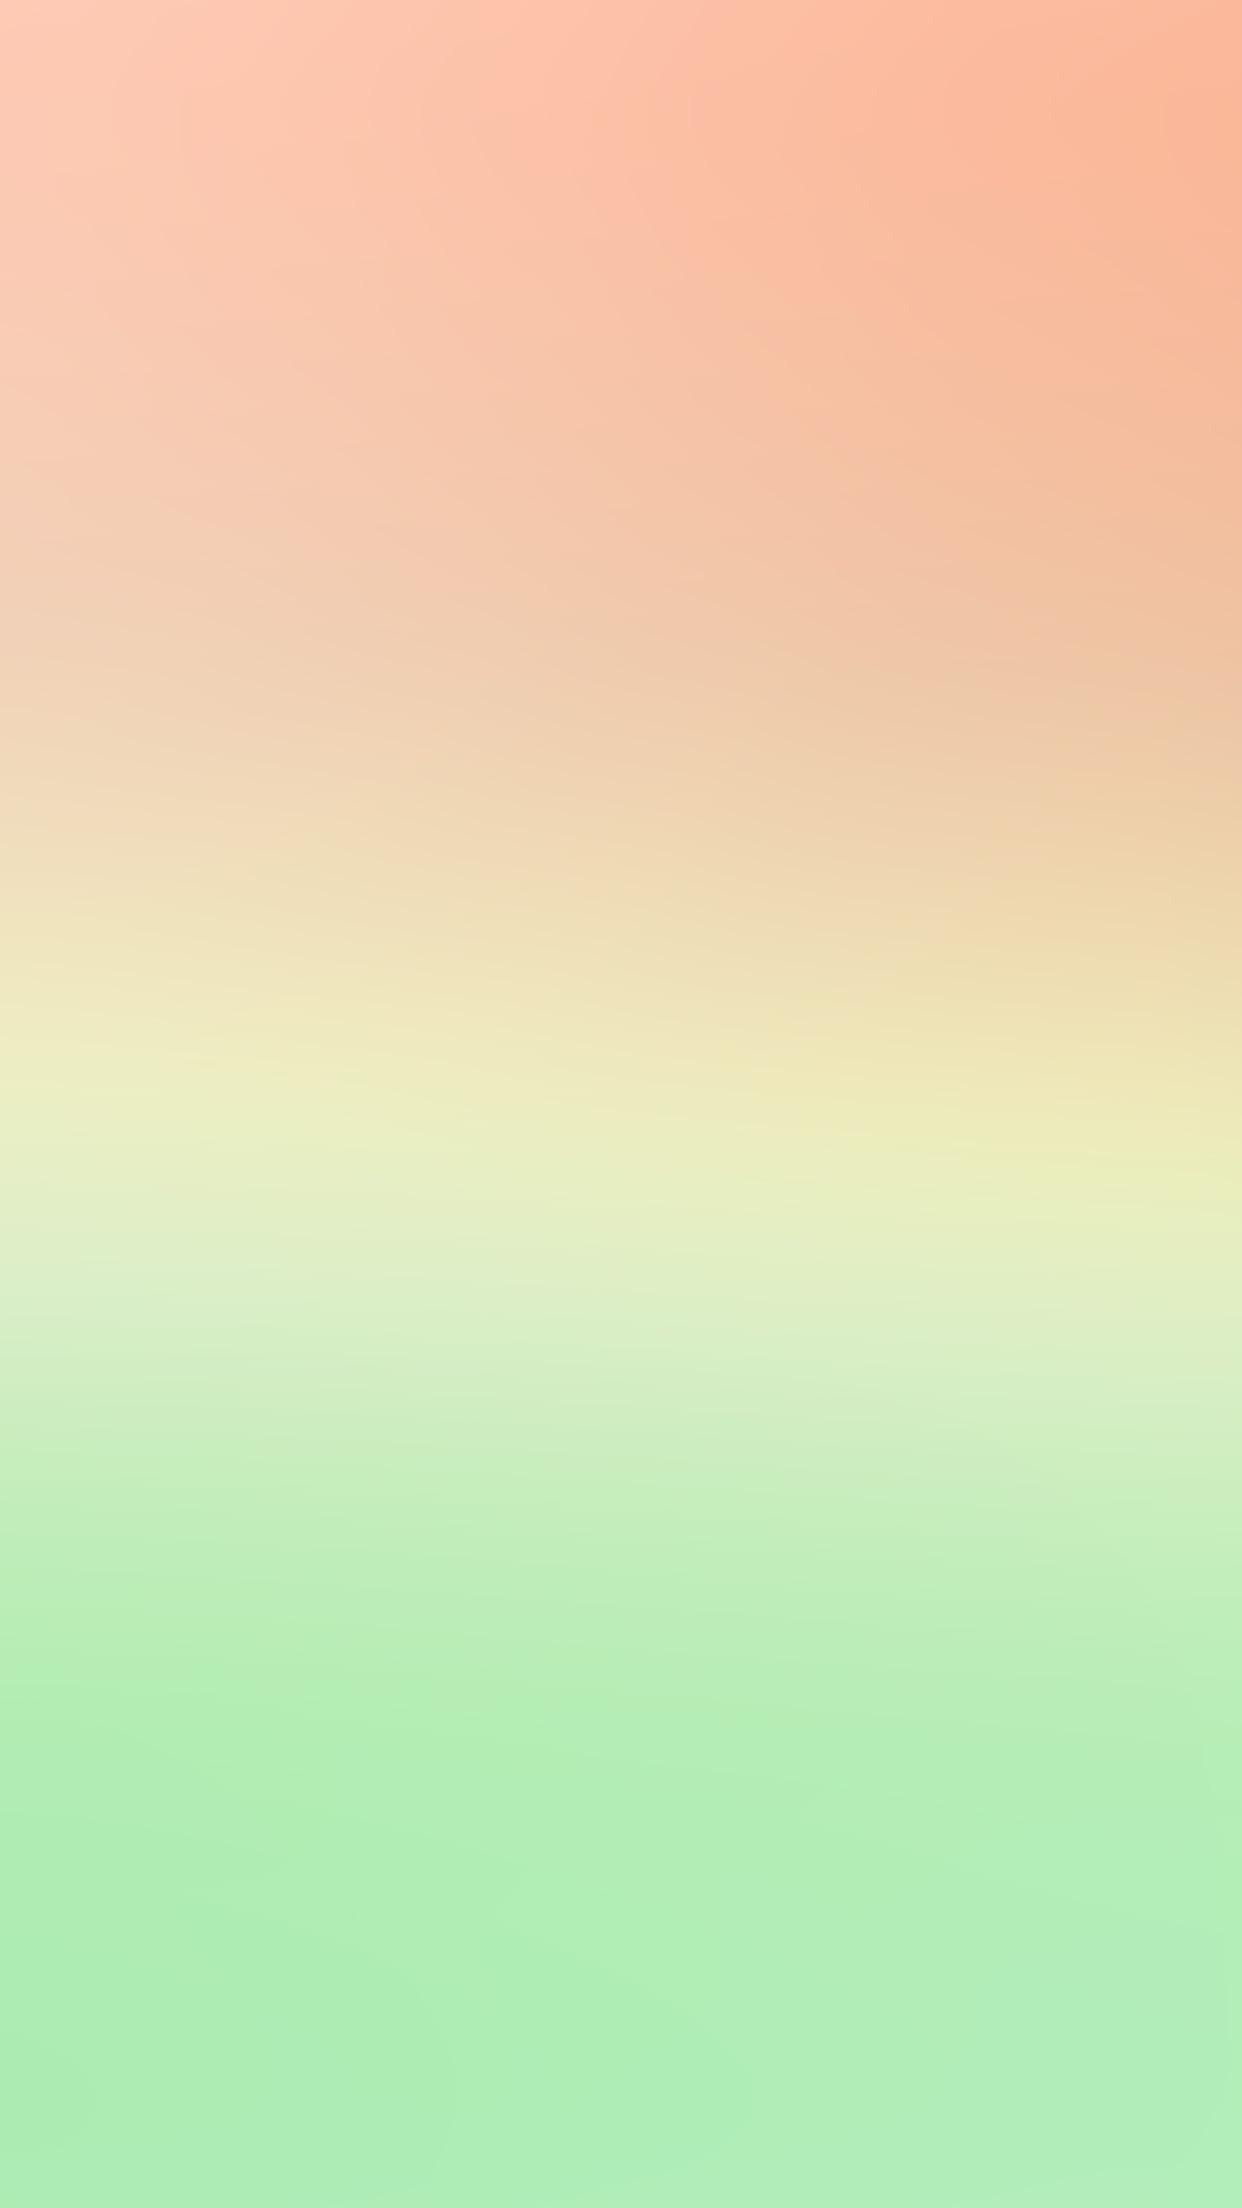 Iphone 6 Plus Car Wallpaper Sl92 Red Green Pastel Blur Gradation Wallpaper